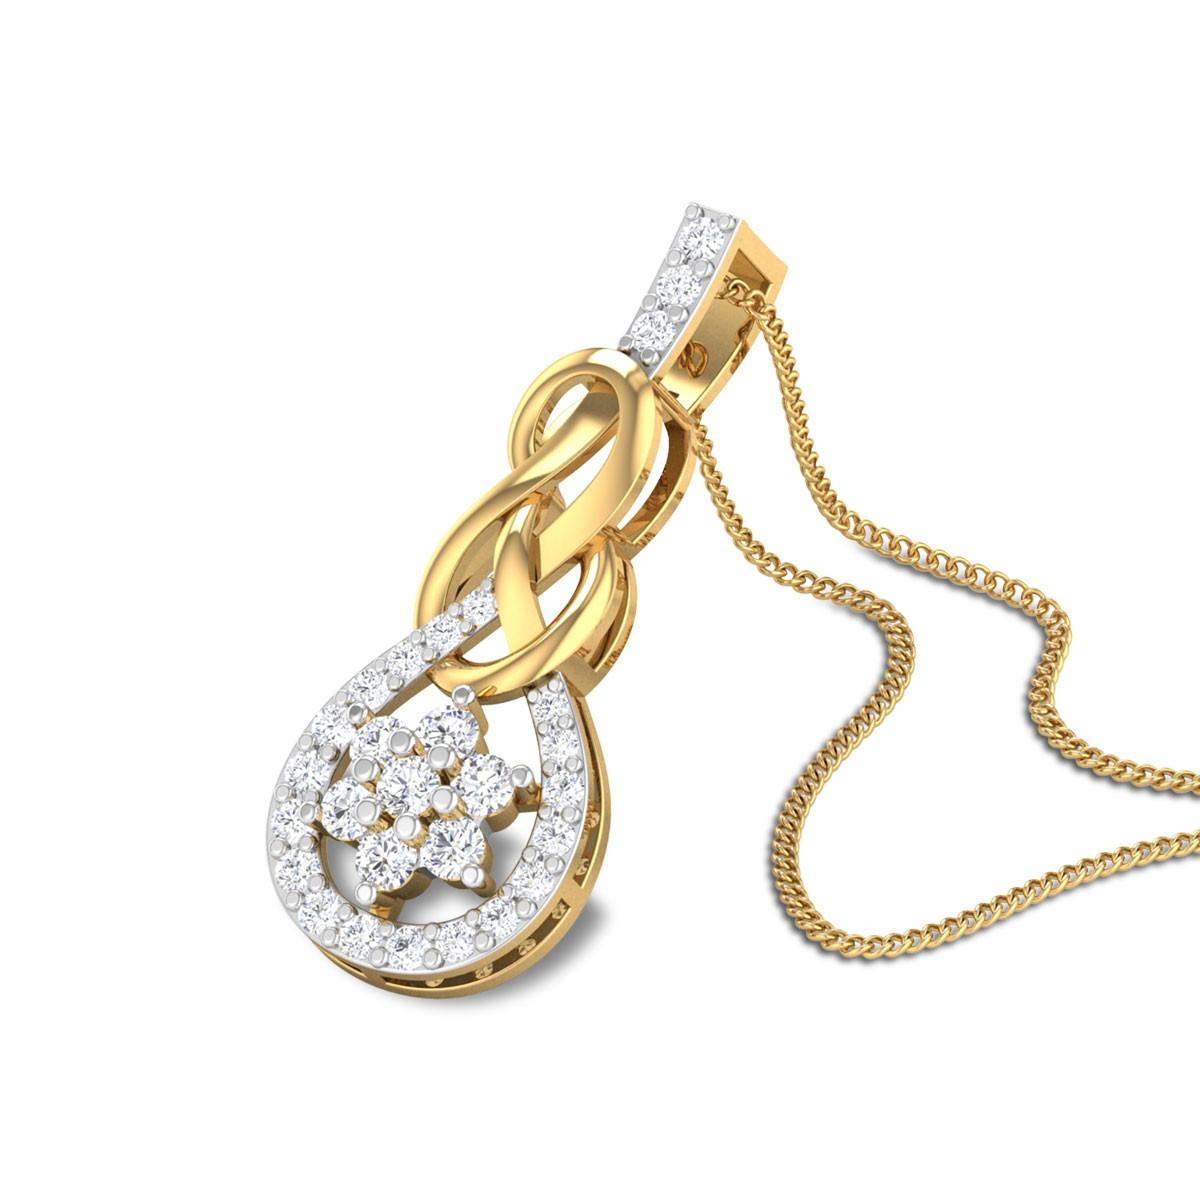 Vesper Floral Diamond Pendant